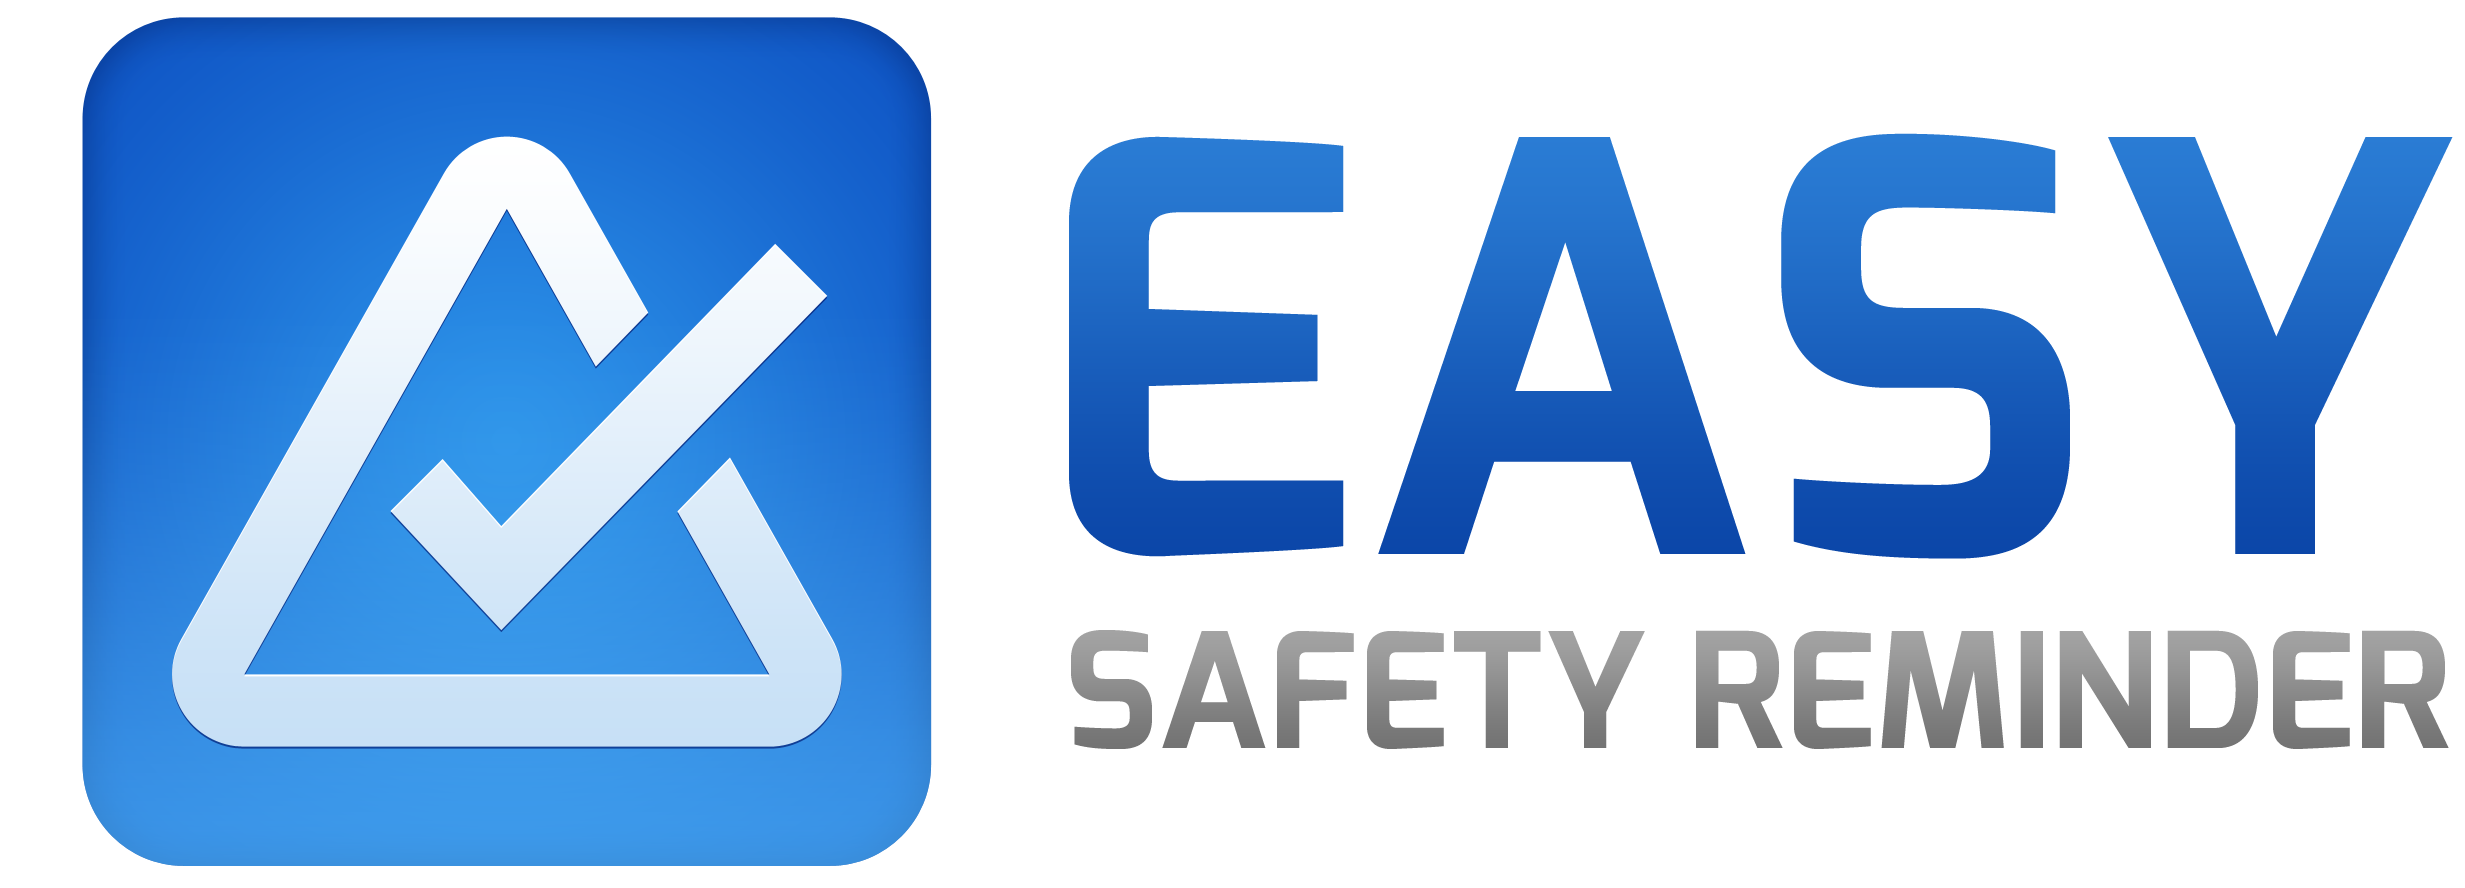 EasySafetyReminder: sicurezza sotto controllo